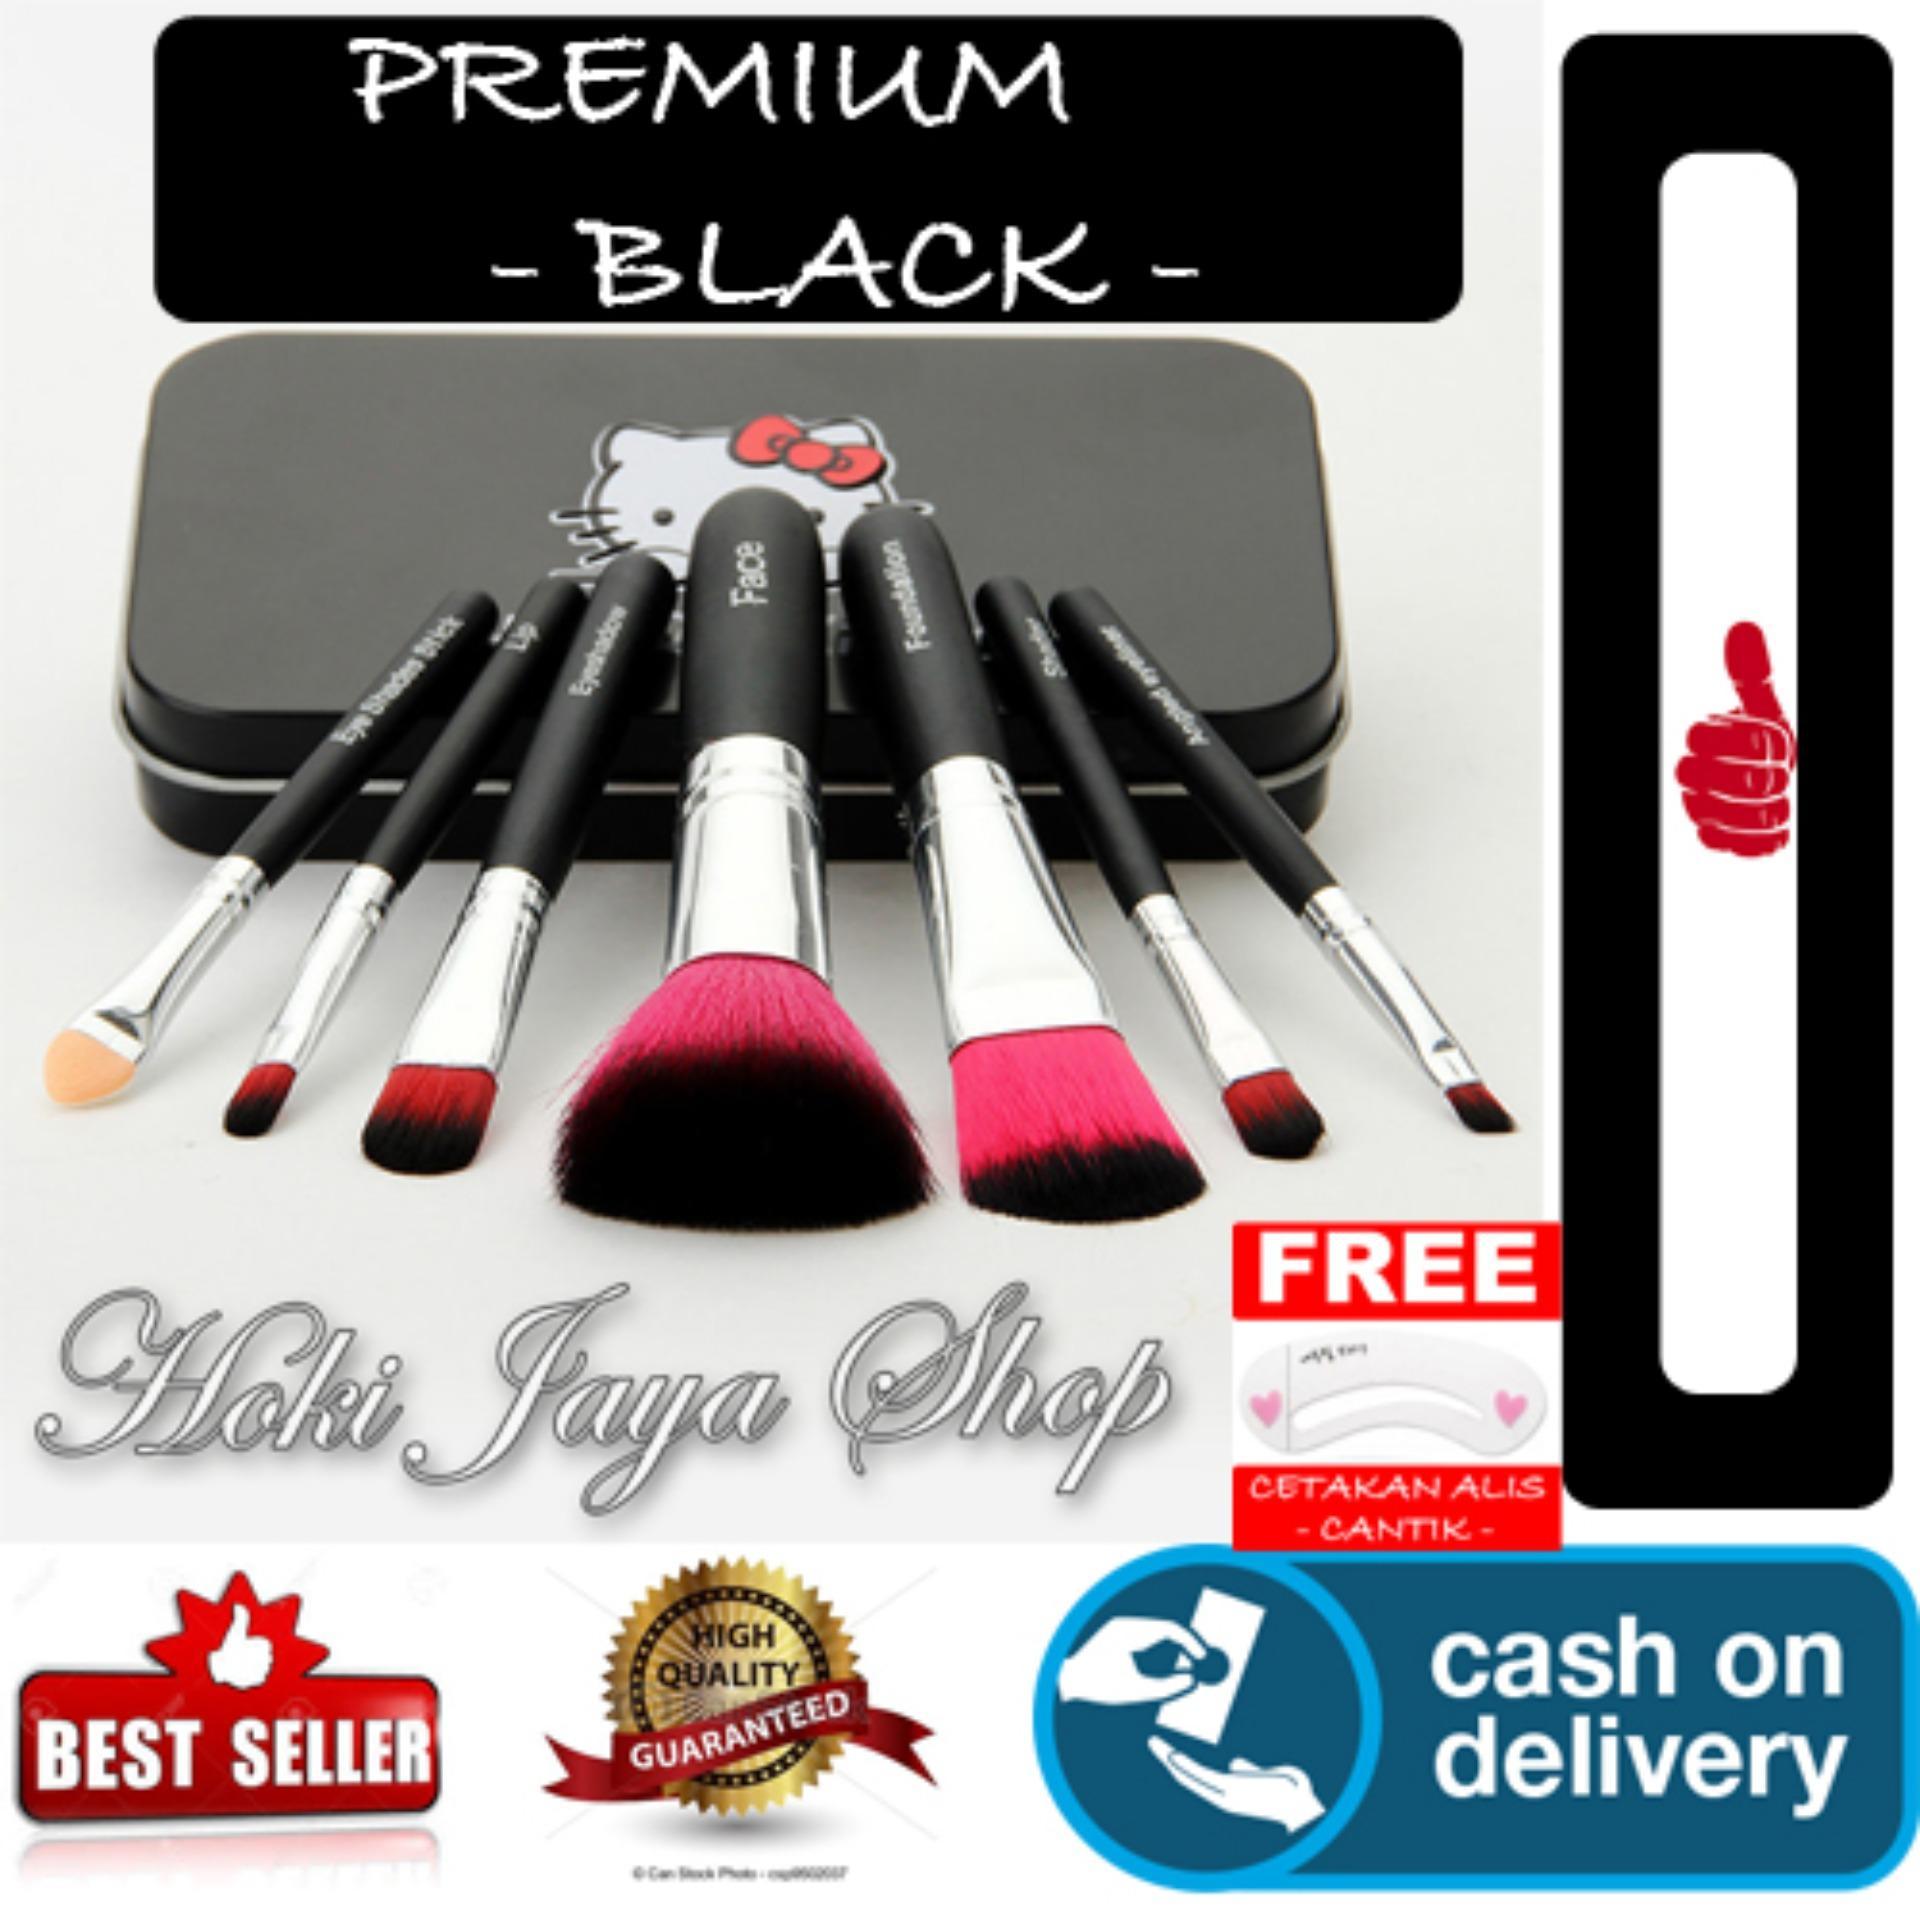 Praktis dan Mudah Dibawa Bepergian HOKI COD - Beautylover 7 Pcs Kitty Mini Makeup Brush Set - Black Limited Edition +